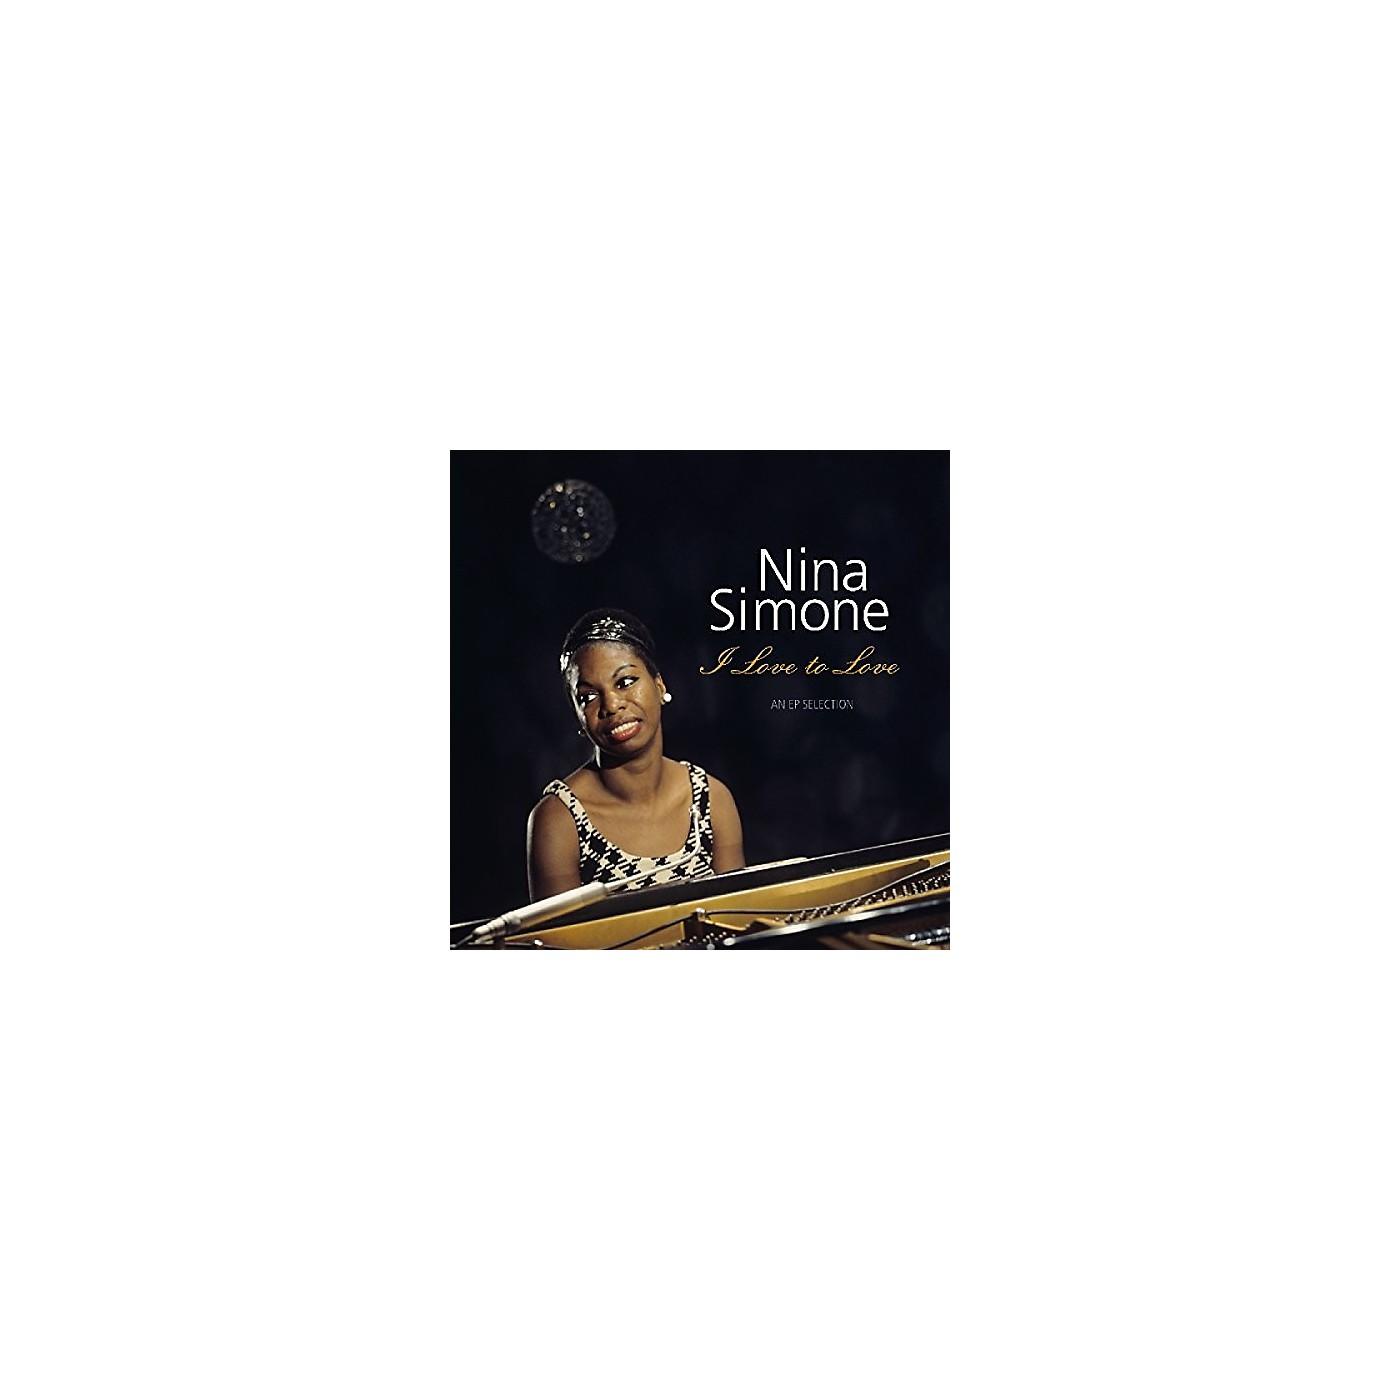 Alliance Nina Simone - I Love To Love: EP Selection thumbnail